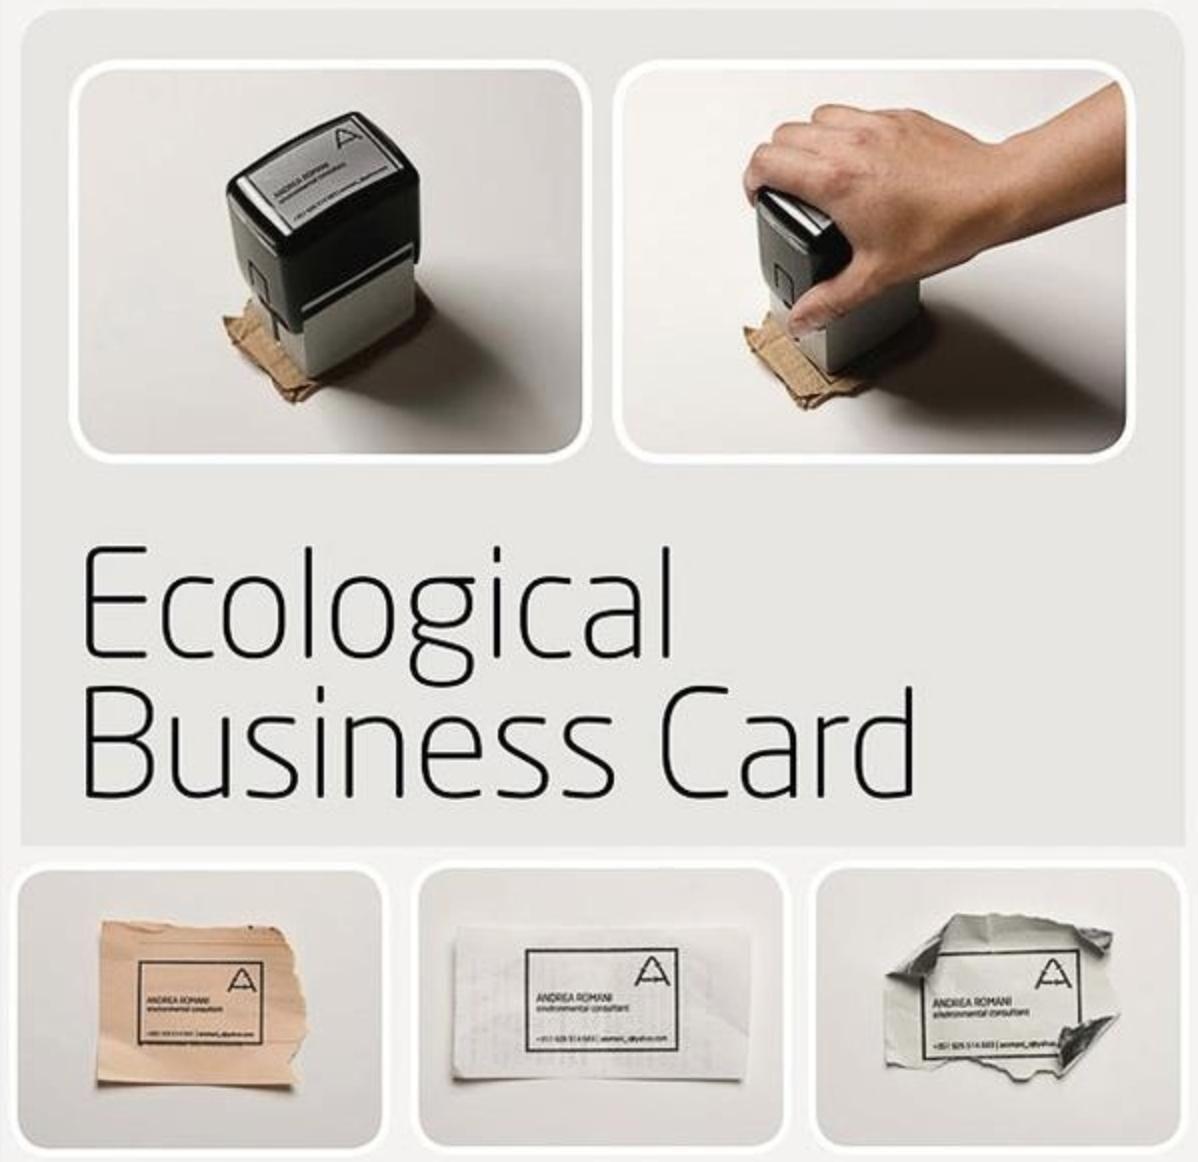 eco-business cards